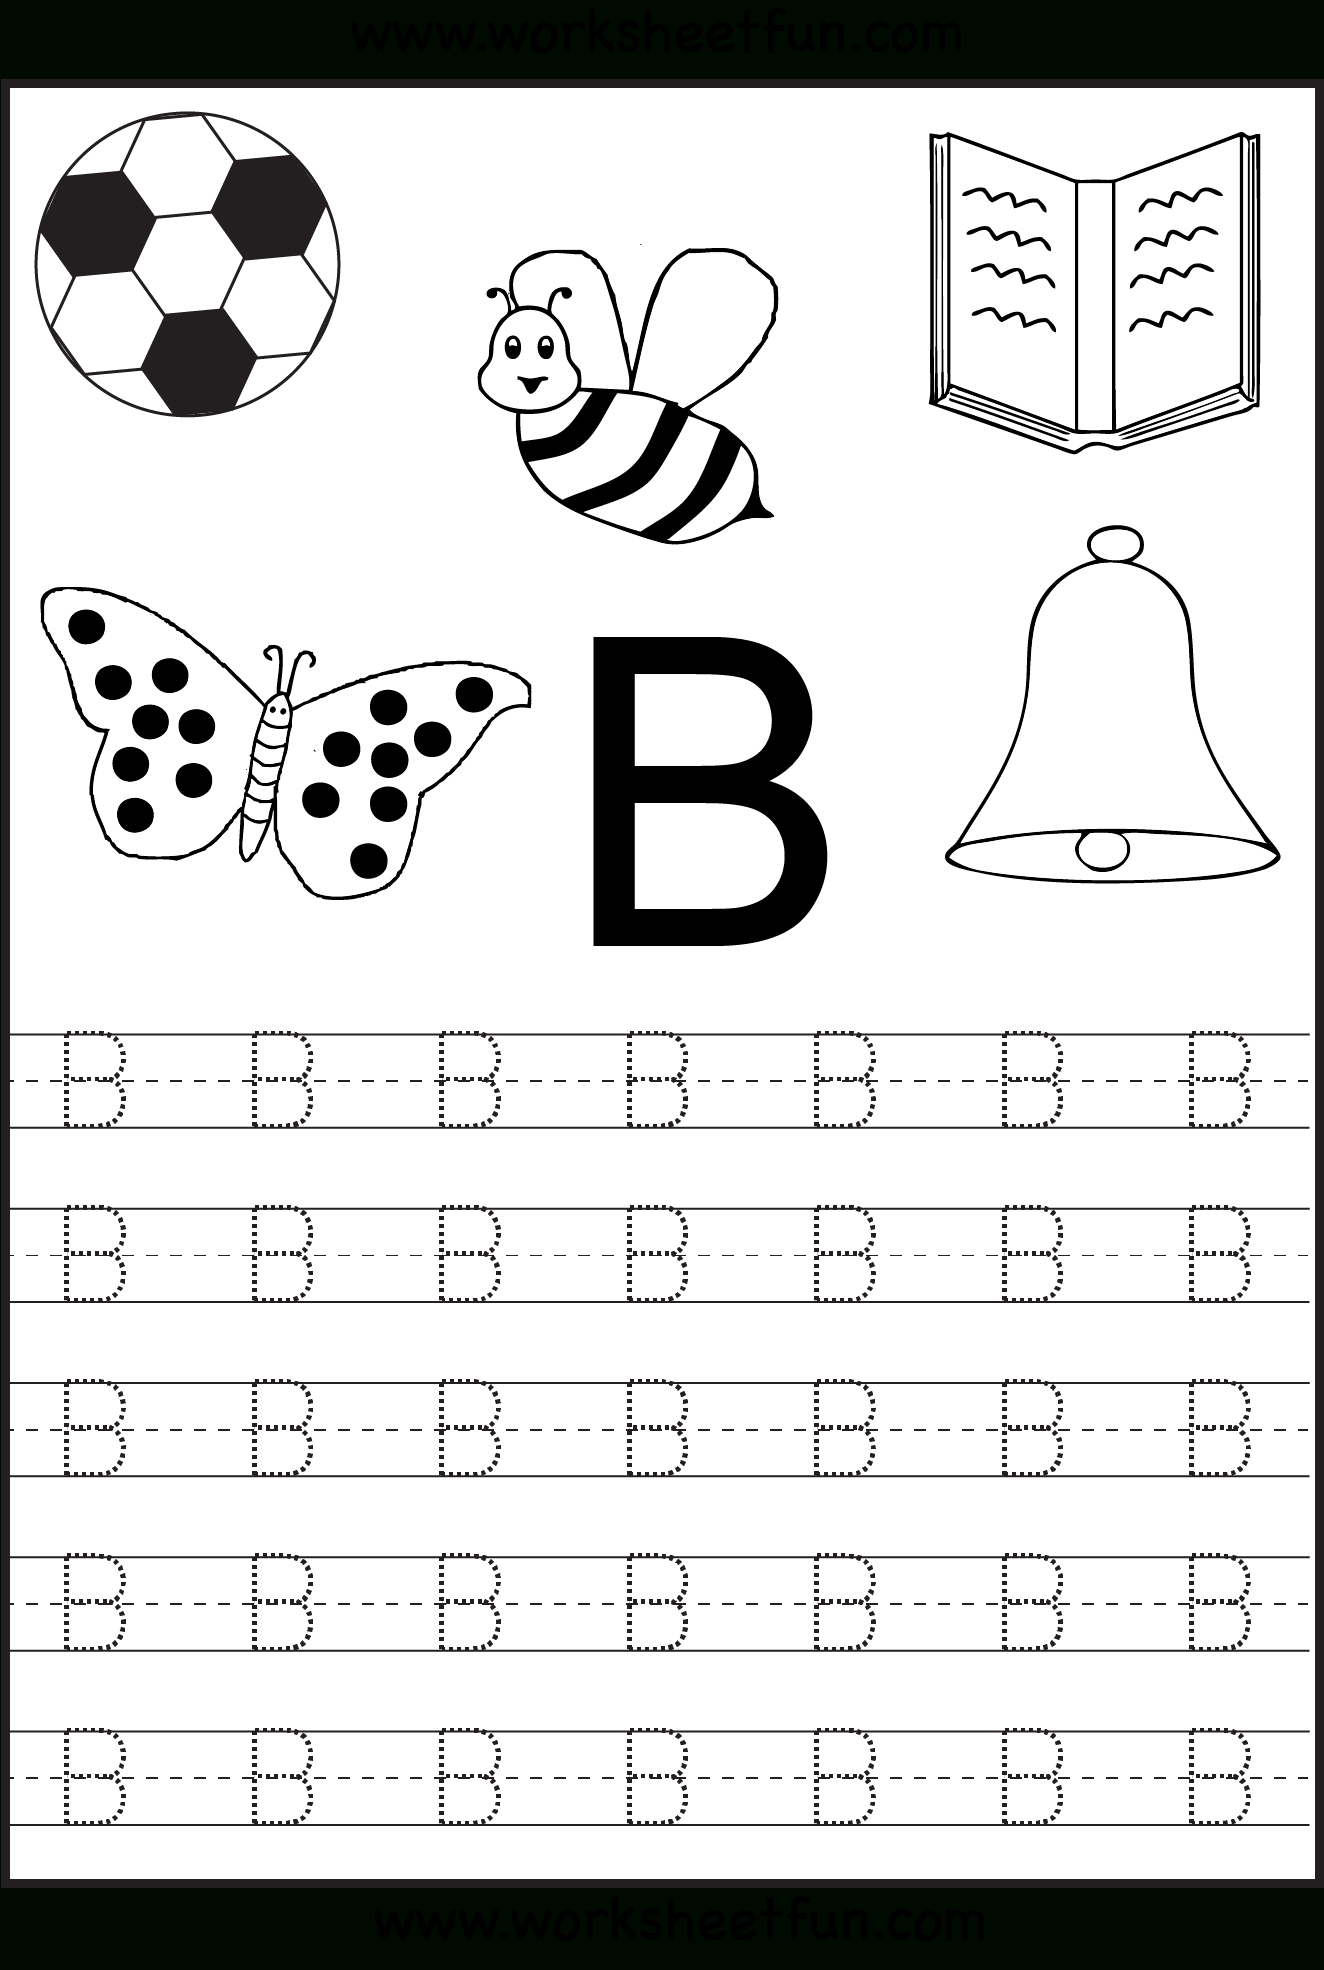 Free Printable Letter Tracing Worksheets For Kindergarten – 26 - Free Printable Hoy Sheets